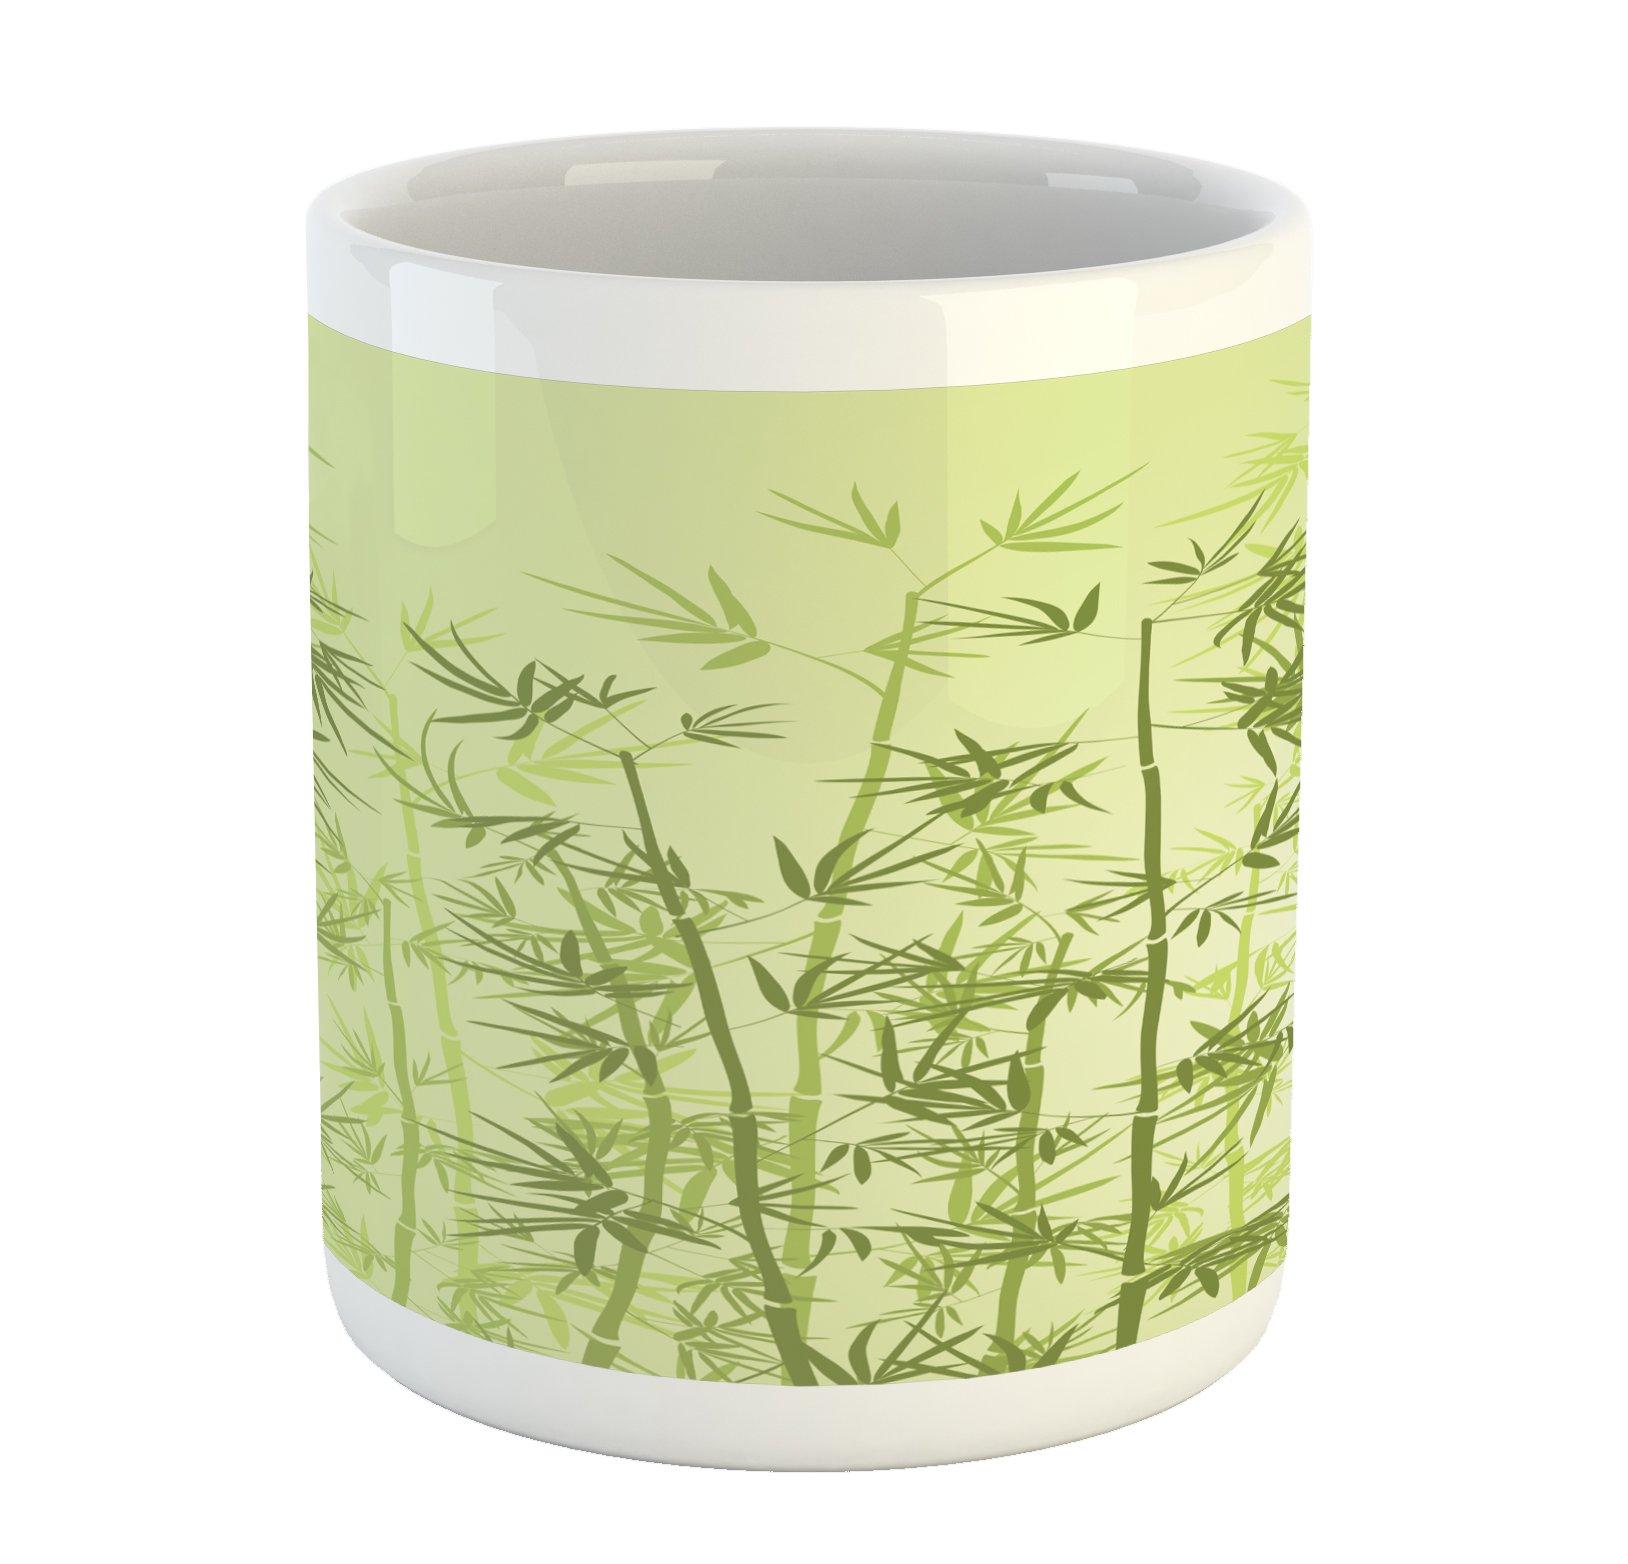 Ambesonne Forest Mug, Tropical Style Woodland Spiritual Nature Spa Chakra Zen Yoga Concept, Printed Ceramic Coffee Mug Water Tea Drinks Cup, Pale Green Dark Green